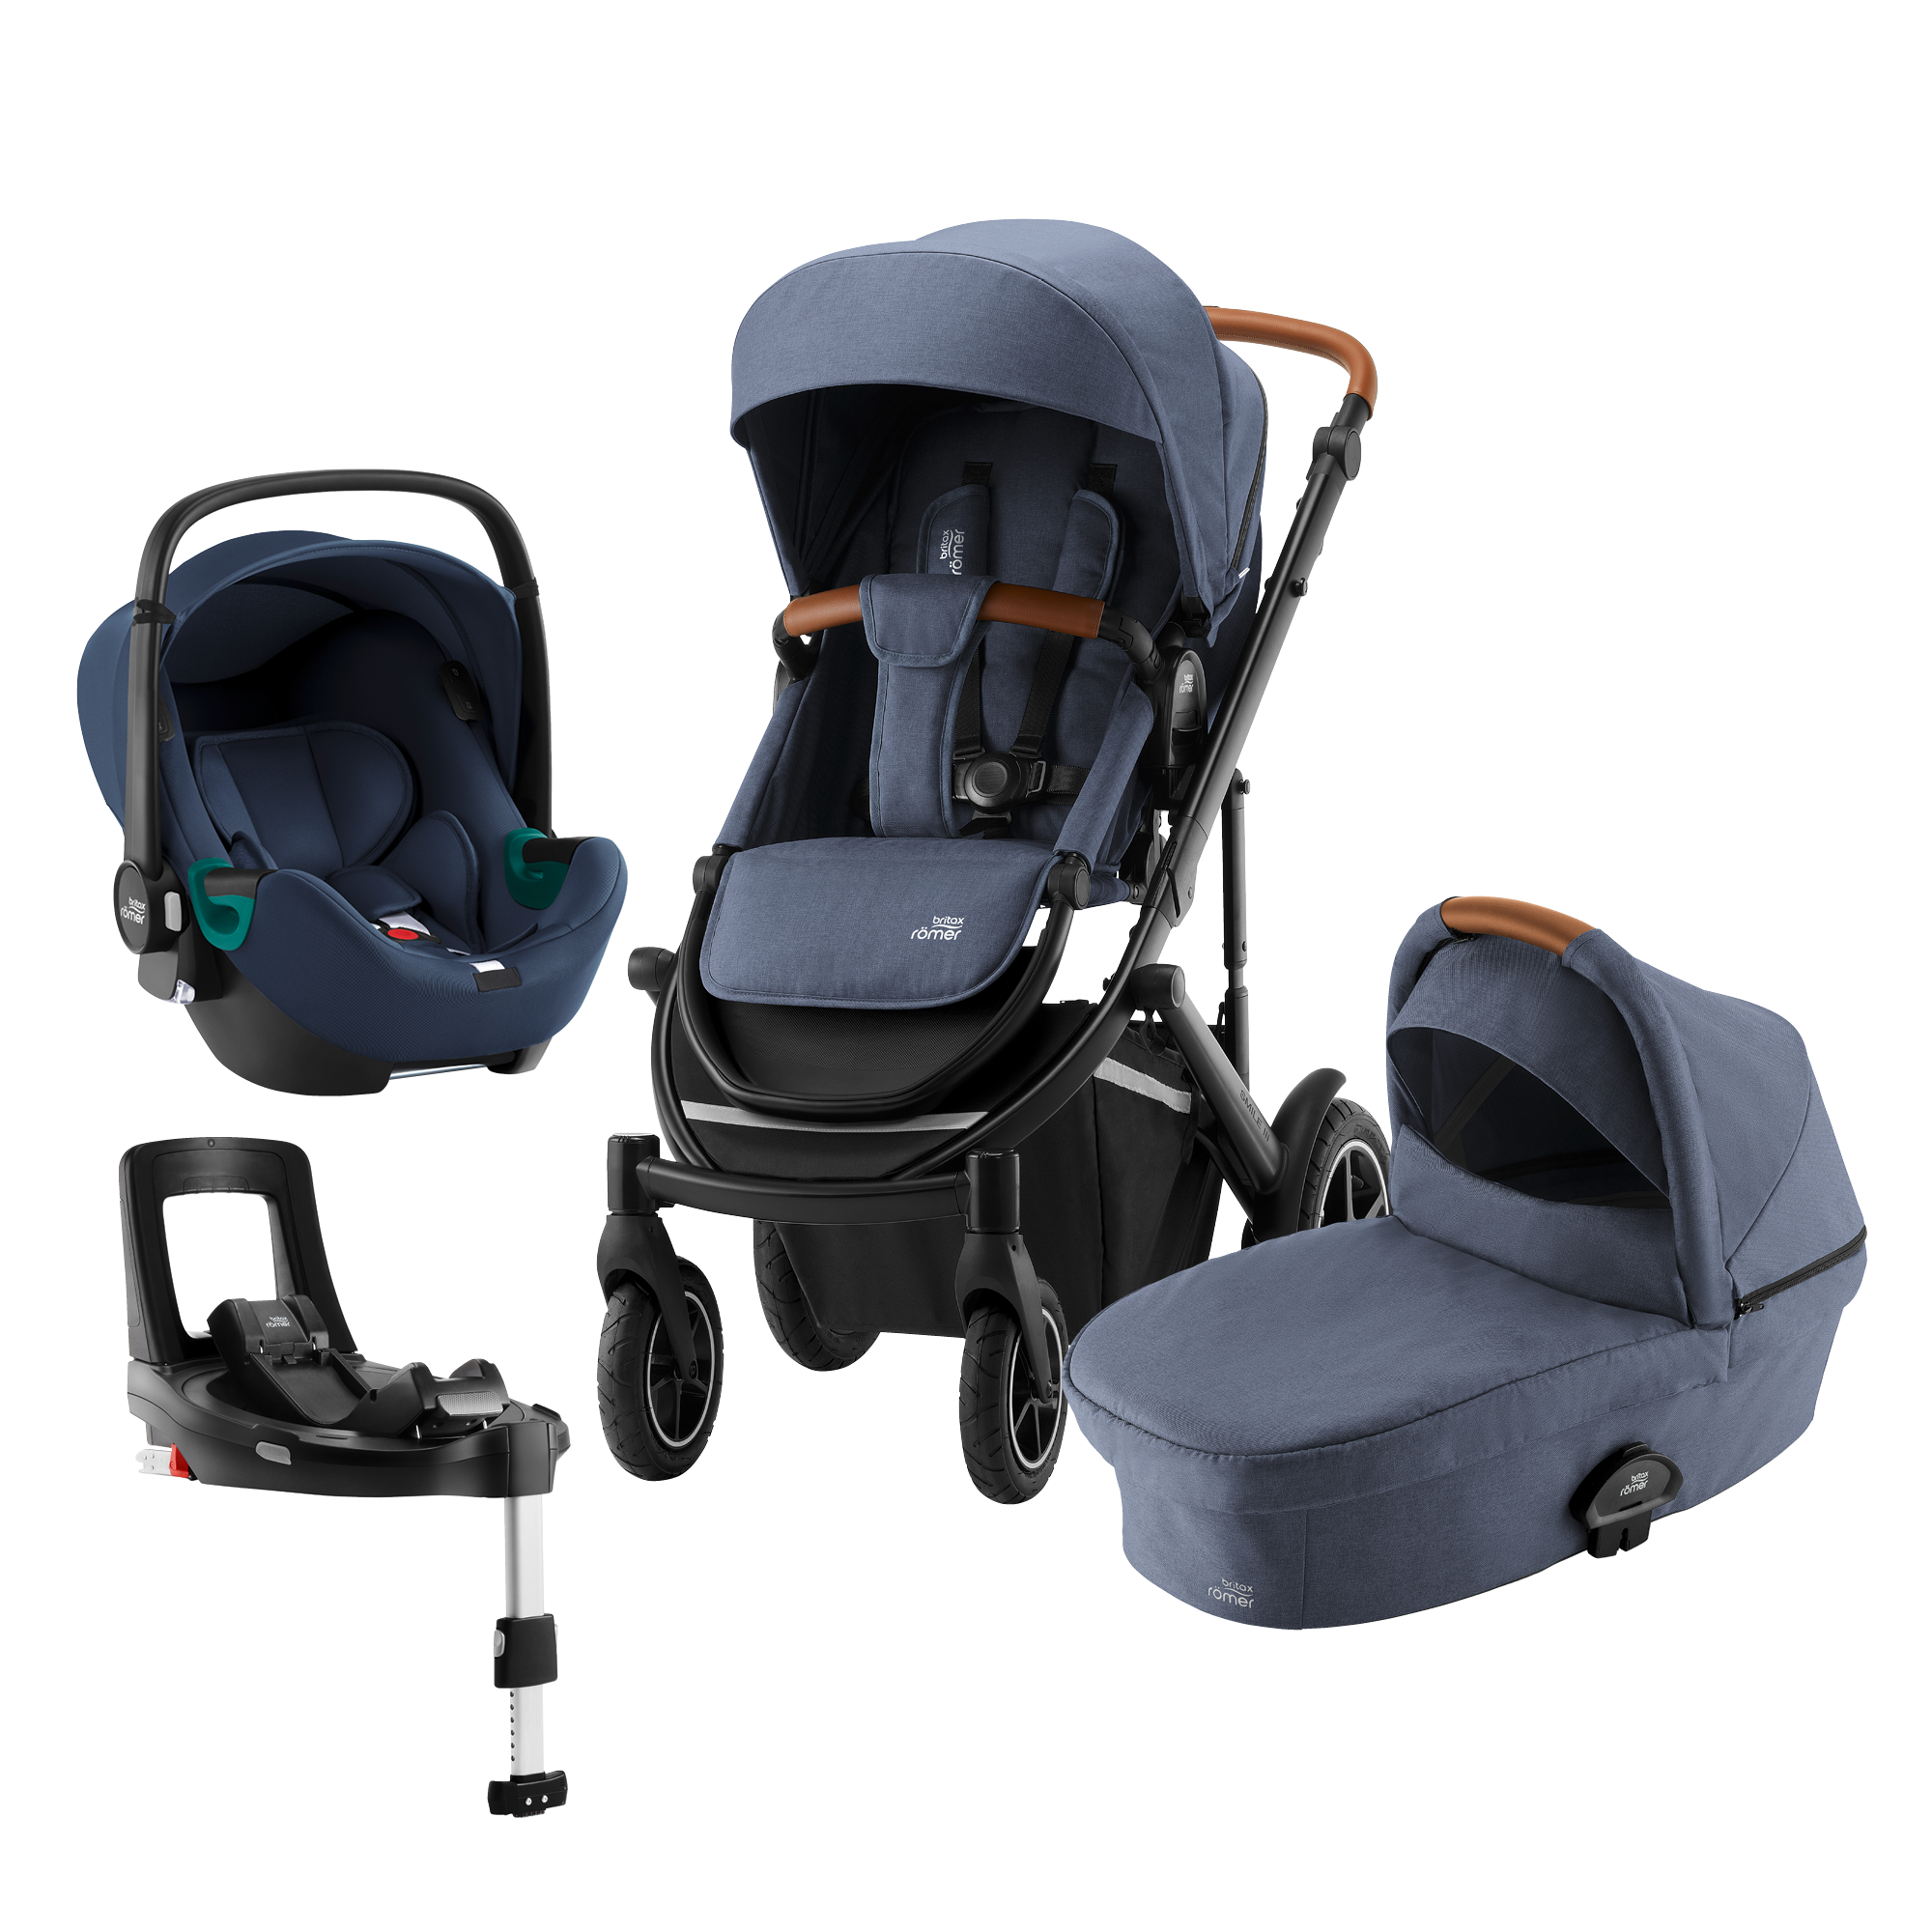 Britax SMILE III Comfort Plus iSENSE Bundle (Sportwagen + Kinderwagenaufsatz + BABY-SAFE iSENSE SMILE + FLEX BASE iSENSE SMILE)